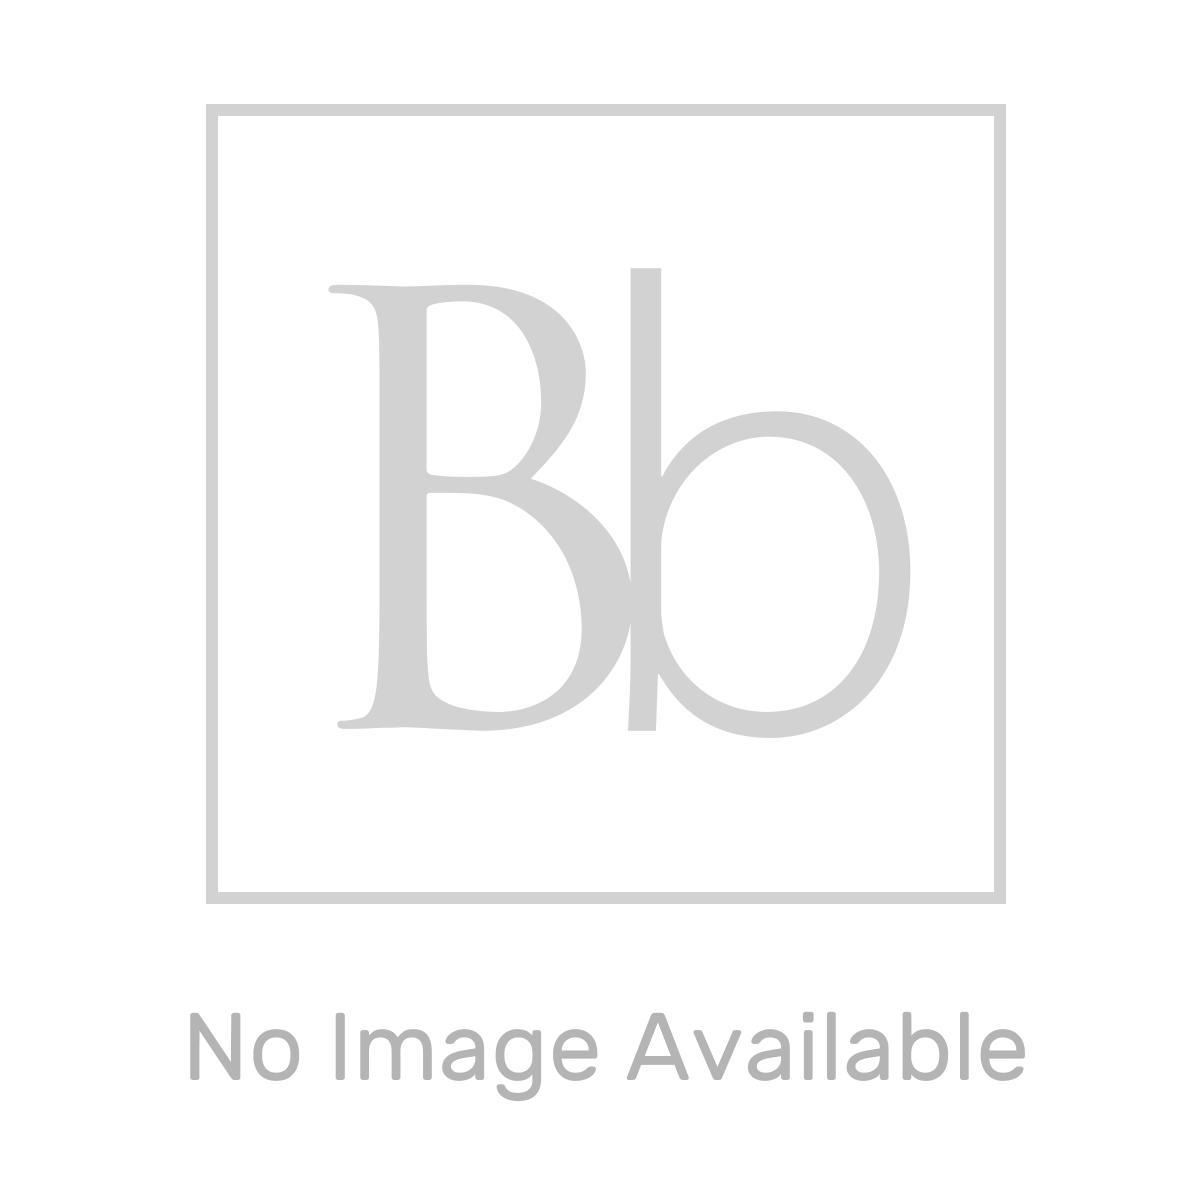 Elation Combination White Furniture Suite with April Destini Pivot Shower Enclosure with Cayton Toilet